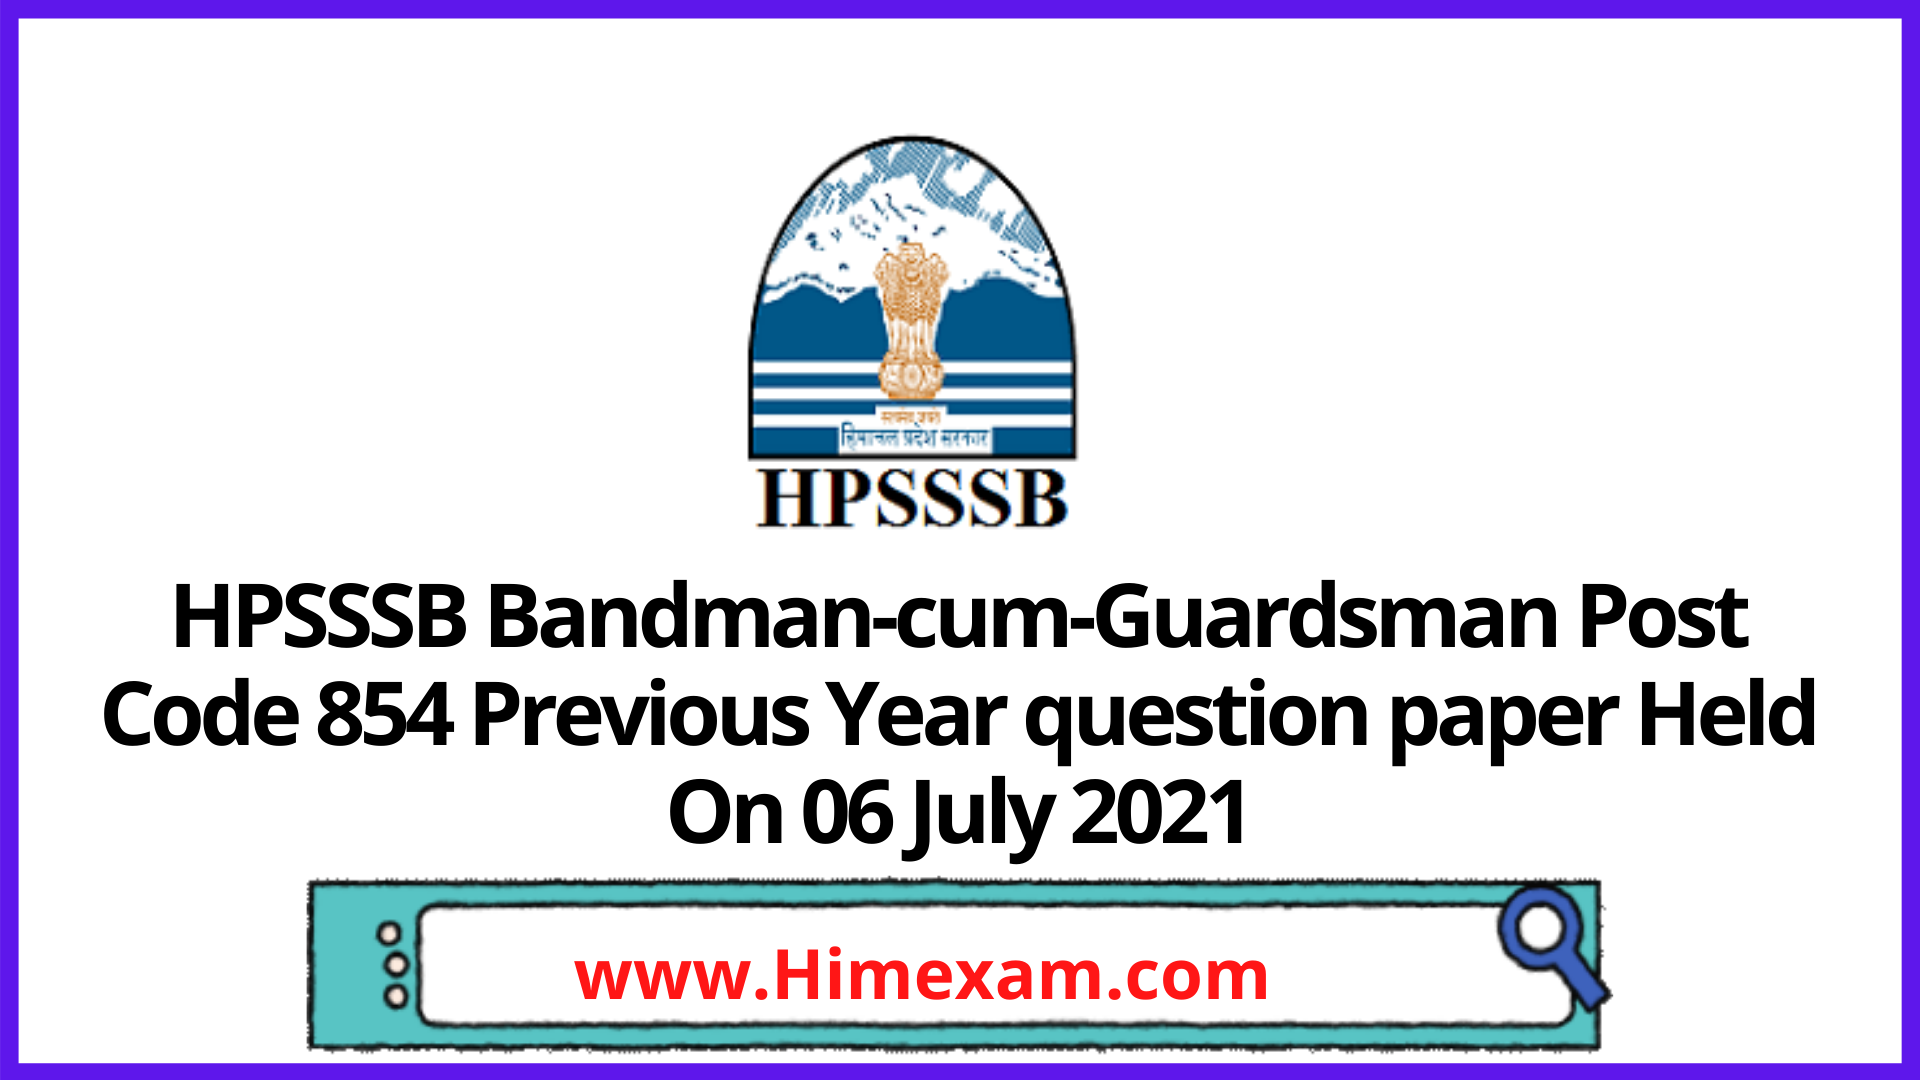 HPSSSB  Bandman-cum-Guardsman Post Code 854  Previous Year question paper Held On 06  July 2021